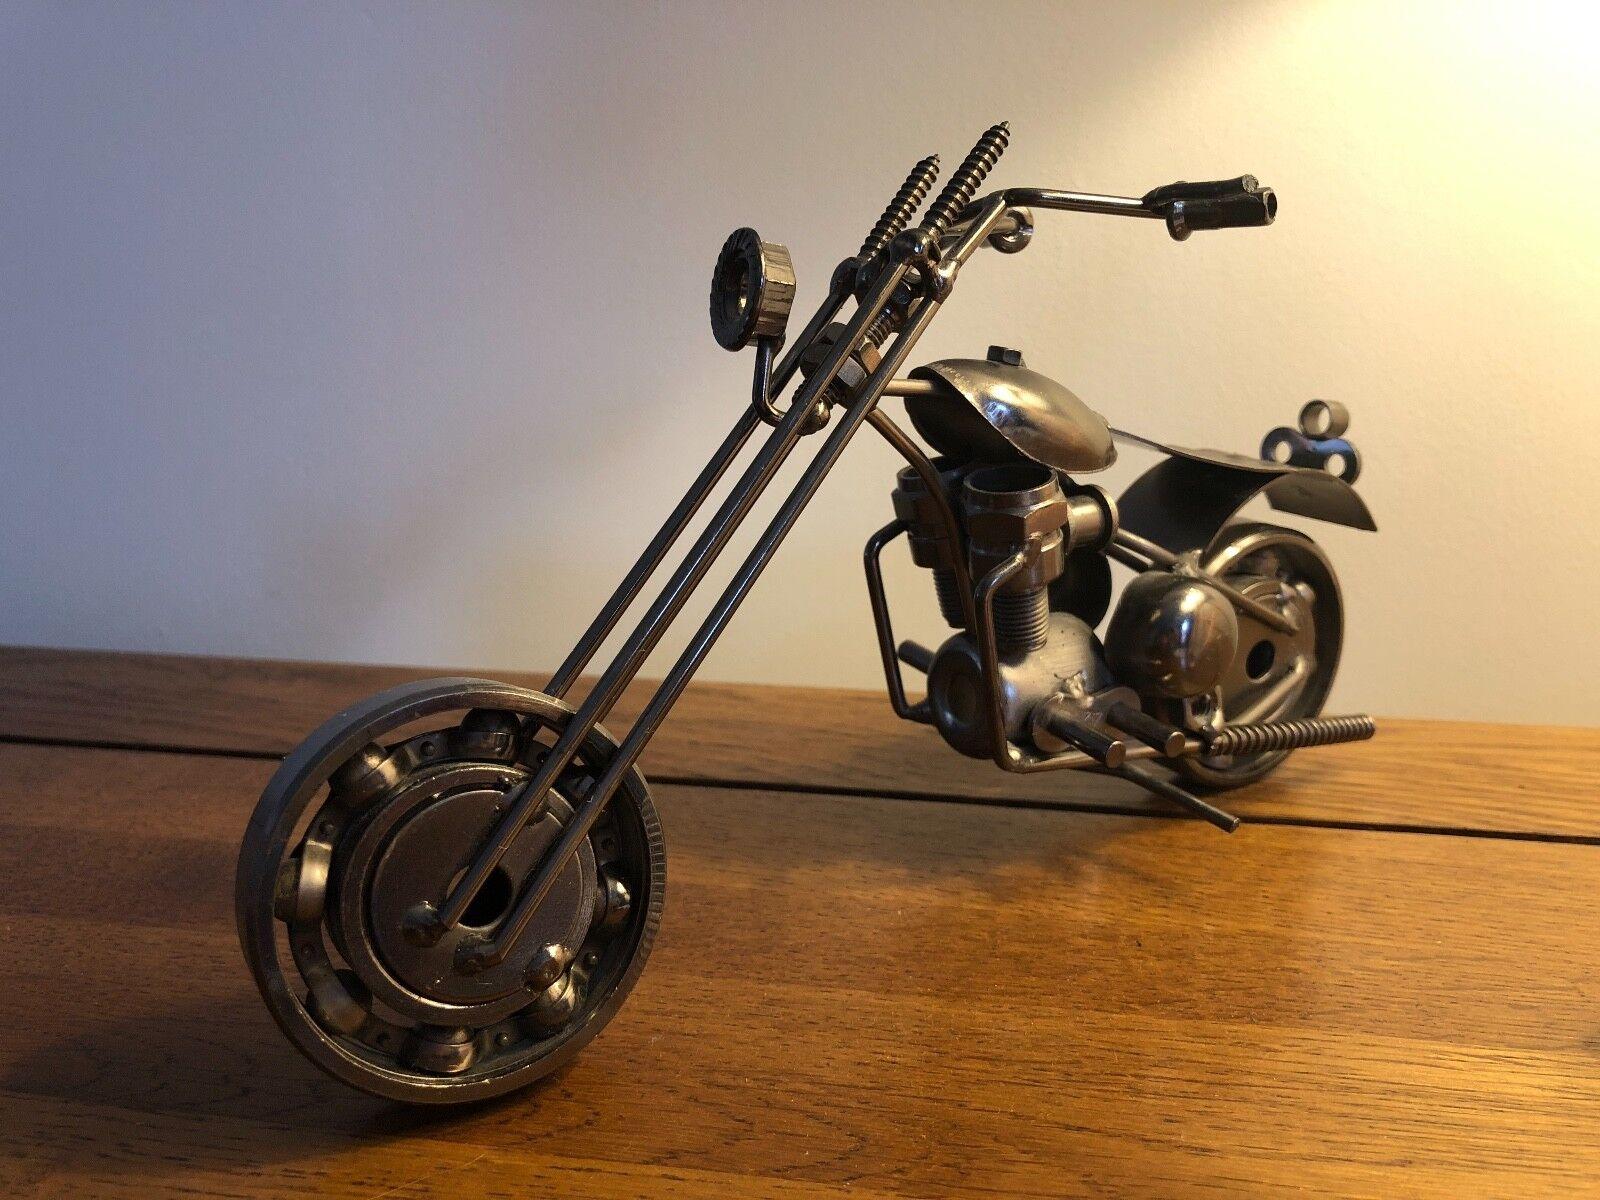 Scrap Metal Art Handmade Nuts and Bolts Chopper Motorbike Gift Model Motorcycle